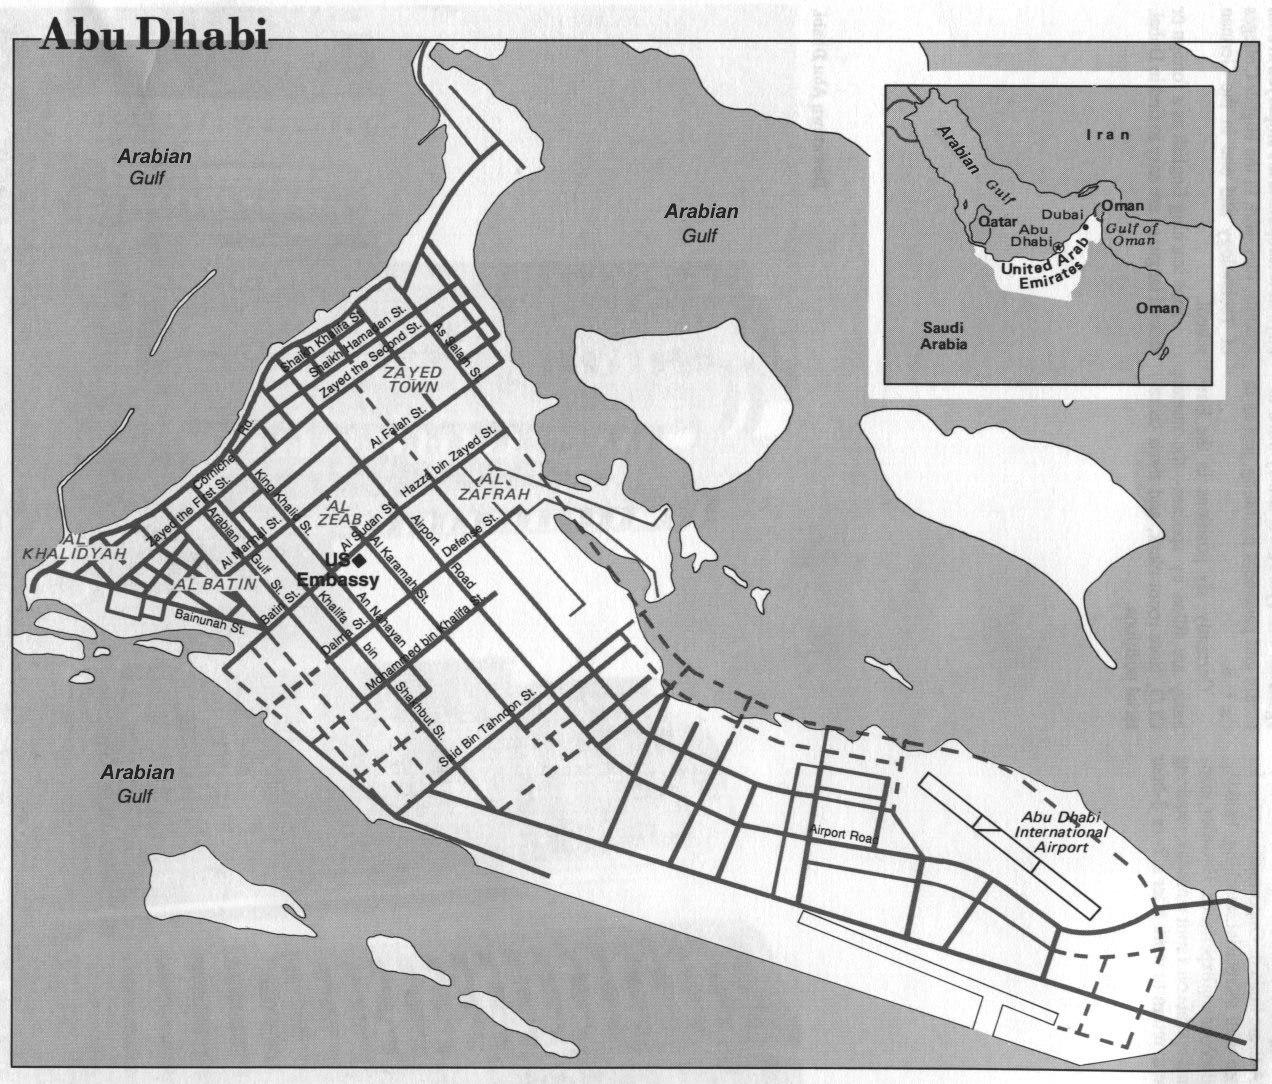 Abu Dhabi City Map - Abu Dhabi United Arab Emirates • mappery